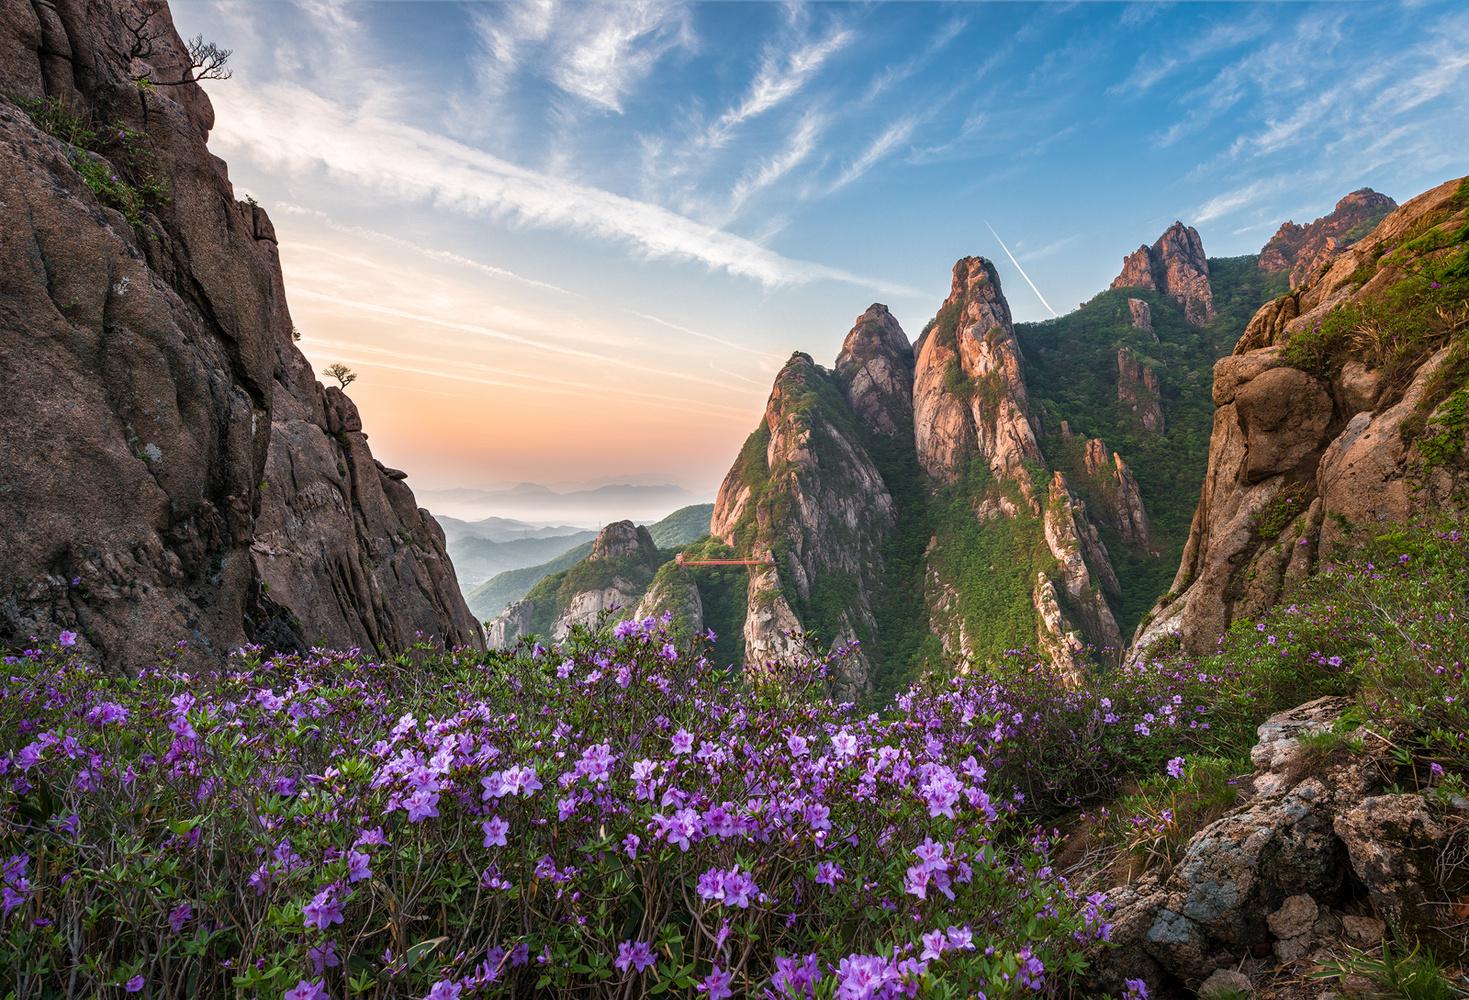 Flowering mountains by jaeyoun Ryu